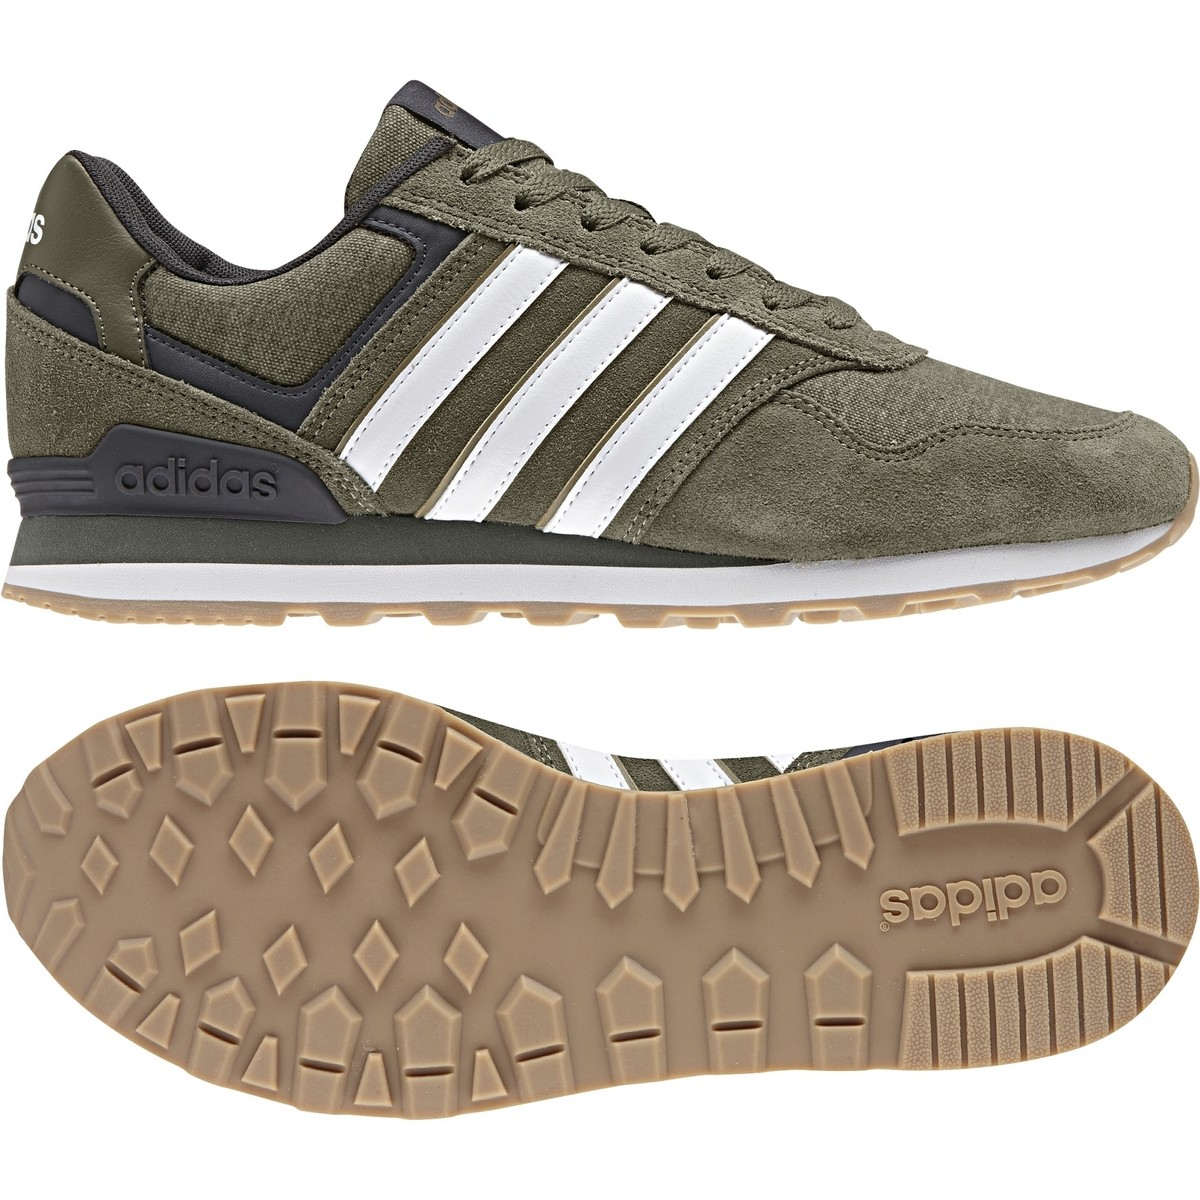 Adidas schuhe 10K grüne cargo Sneaker Neo